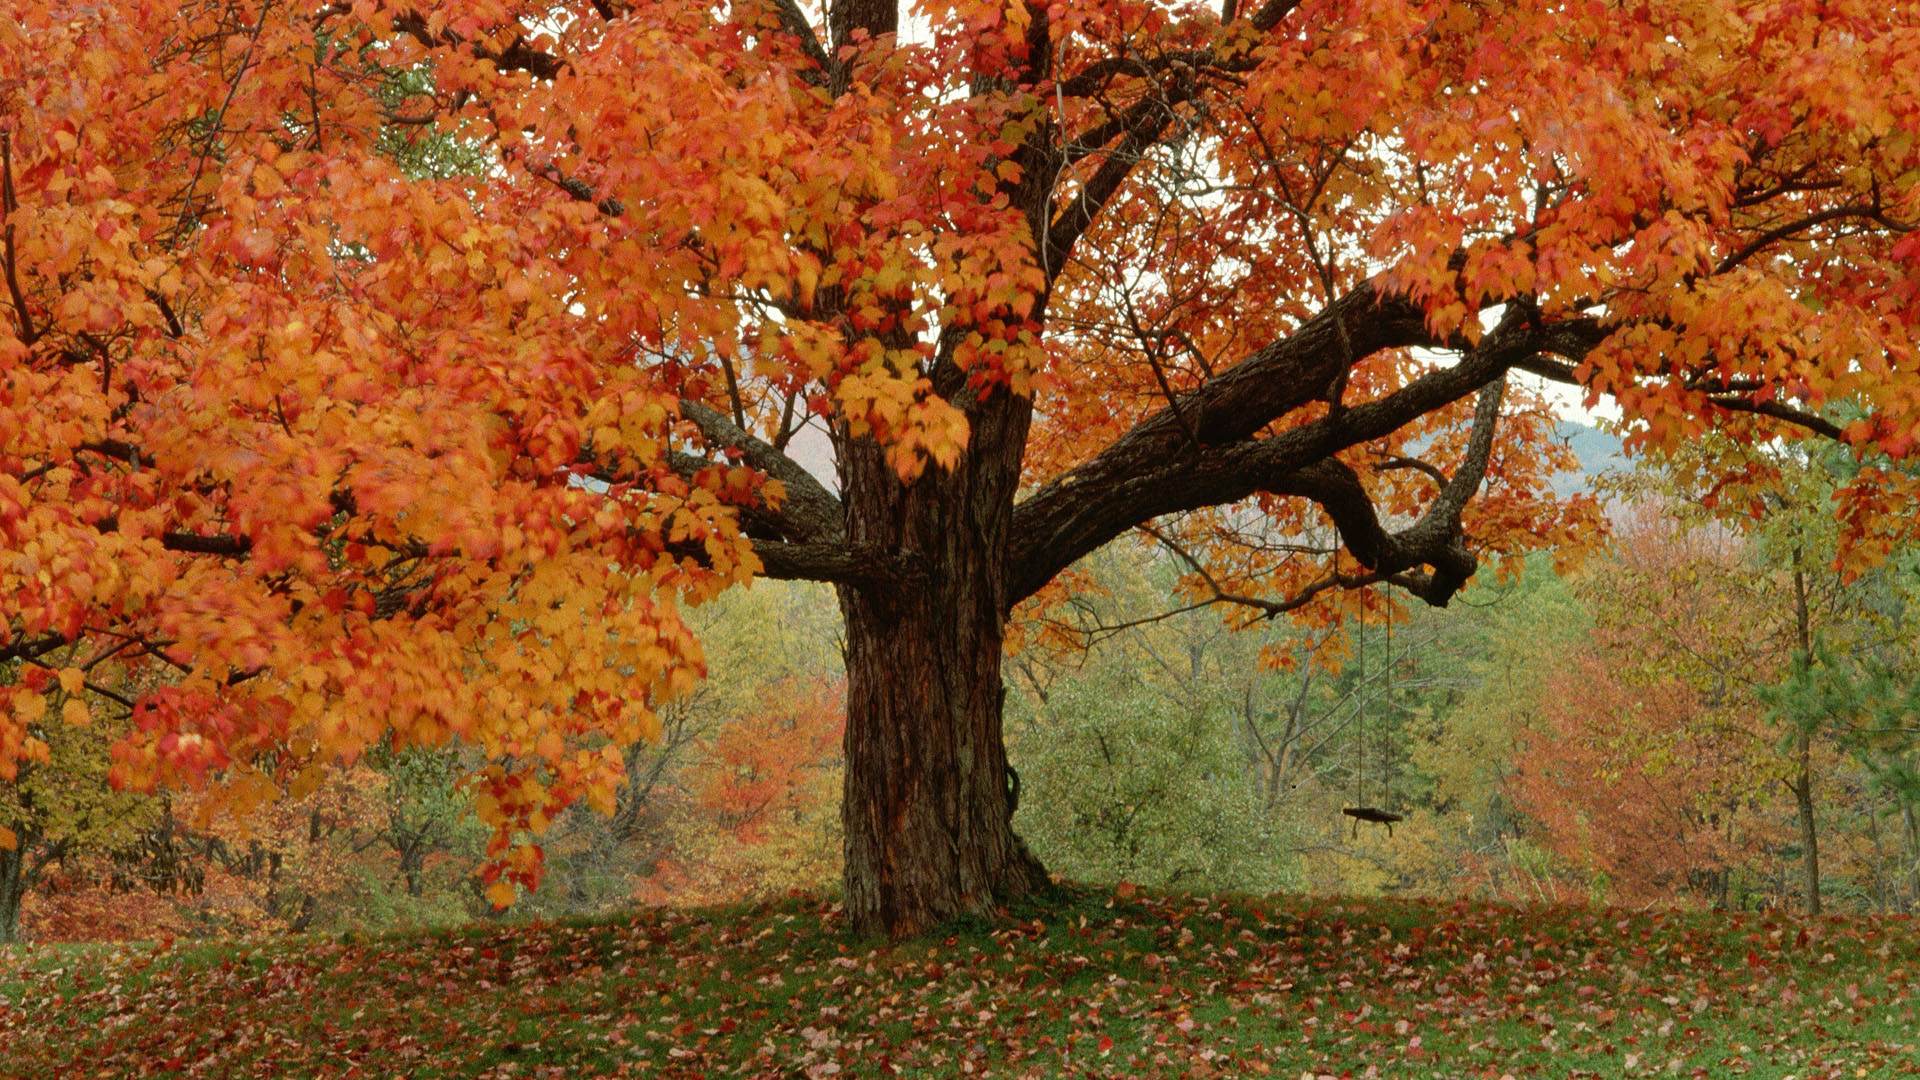 autumn trees wallpaper 1920x1080 1920x1080